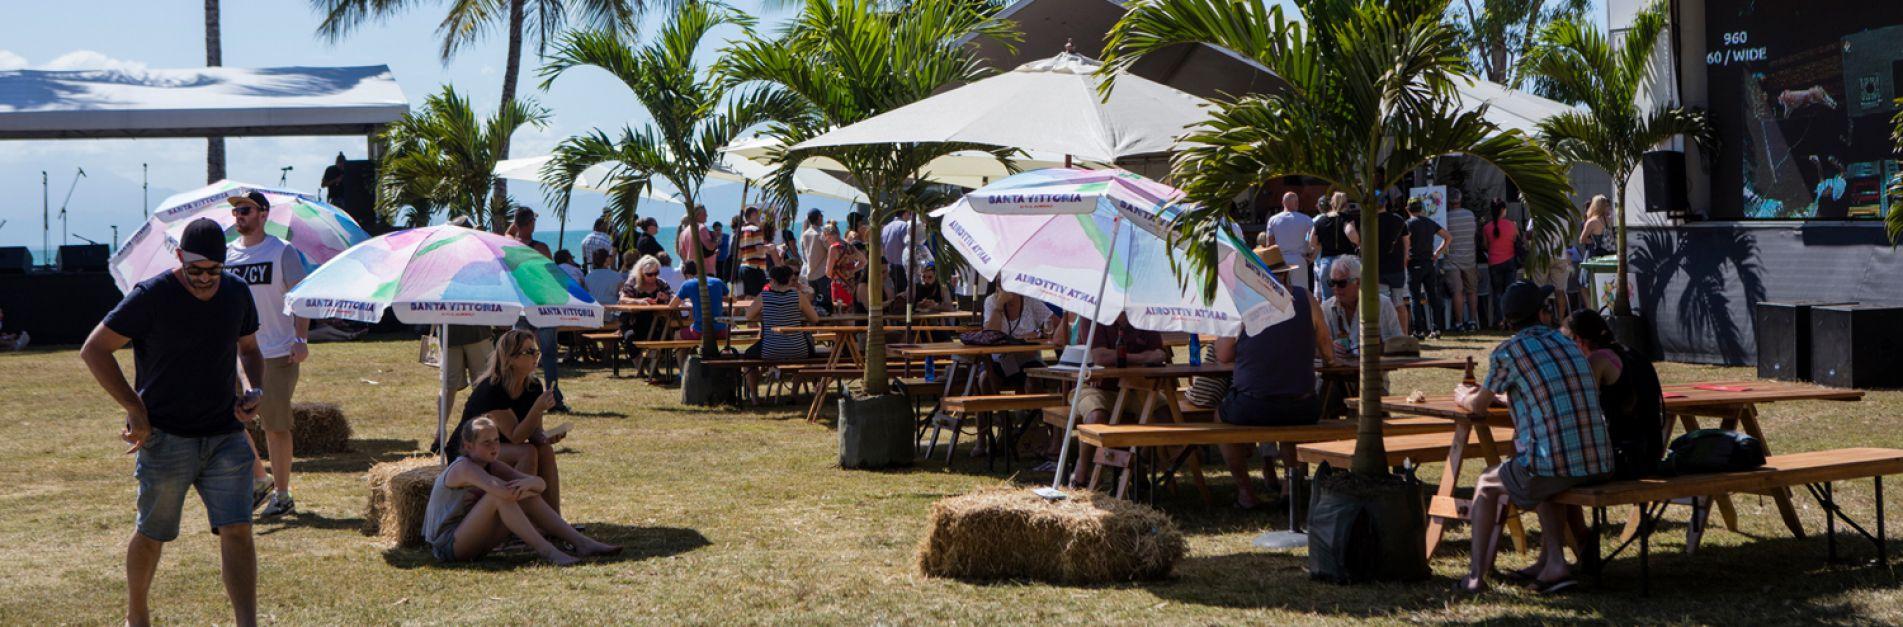 80-13082020110008-0-344-1500-494-1903x627-cropped-taste-port-douglas-food-and-wine-festival-port-douglas-2